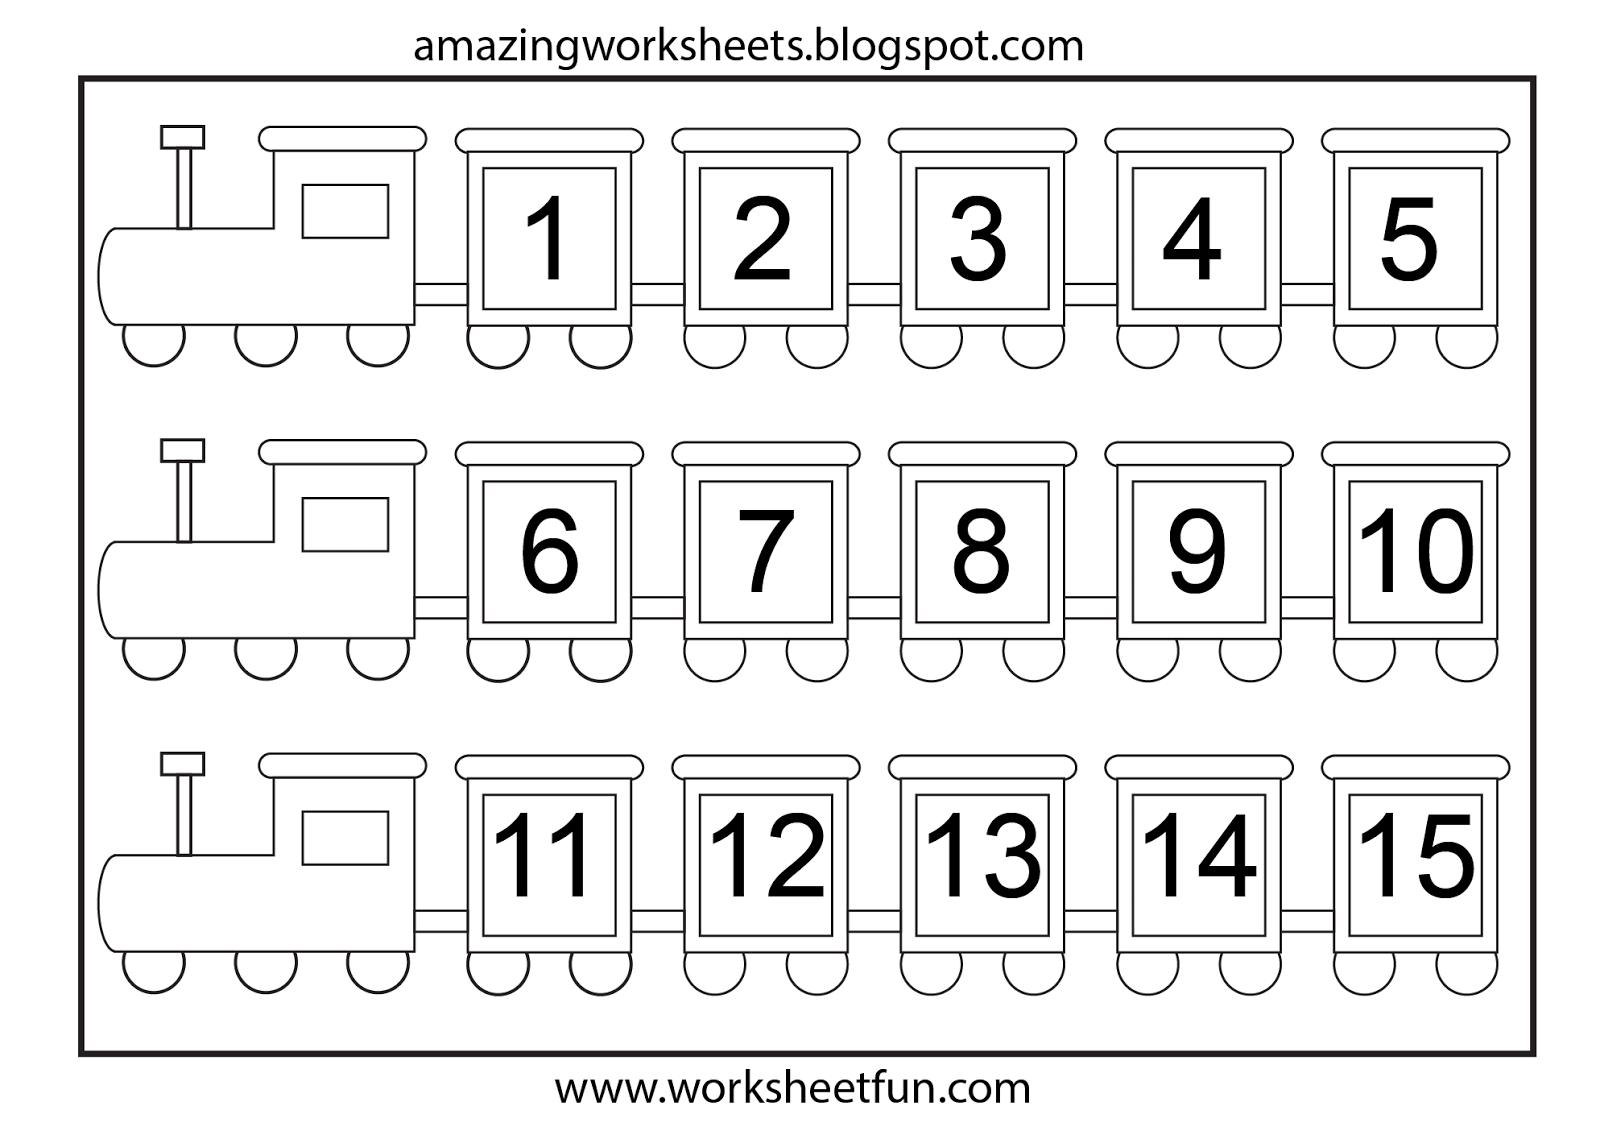 Worksheets Missing Number Worksheets 1-20 number chart 1 15 math pinterest and missing numbers 3 worksheets free printable worksheets